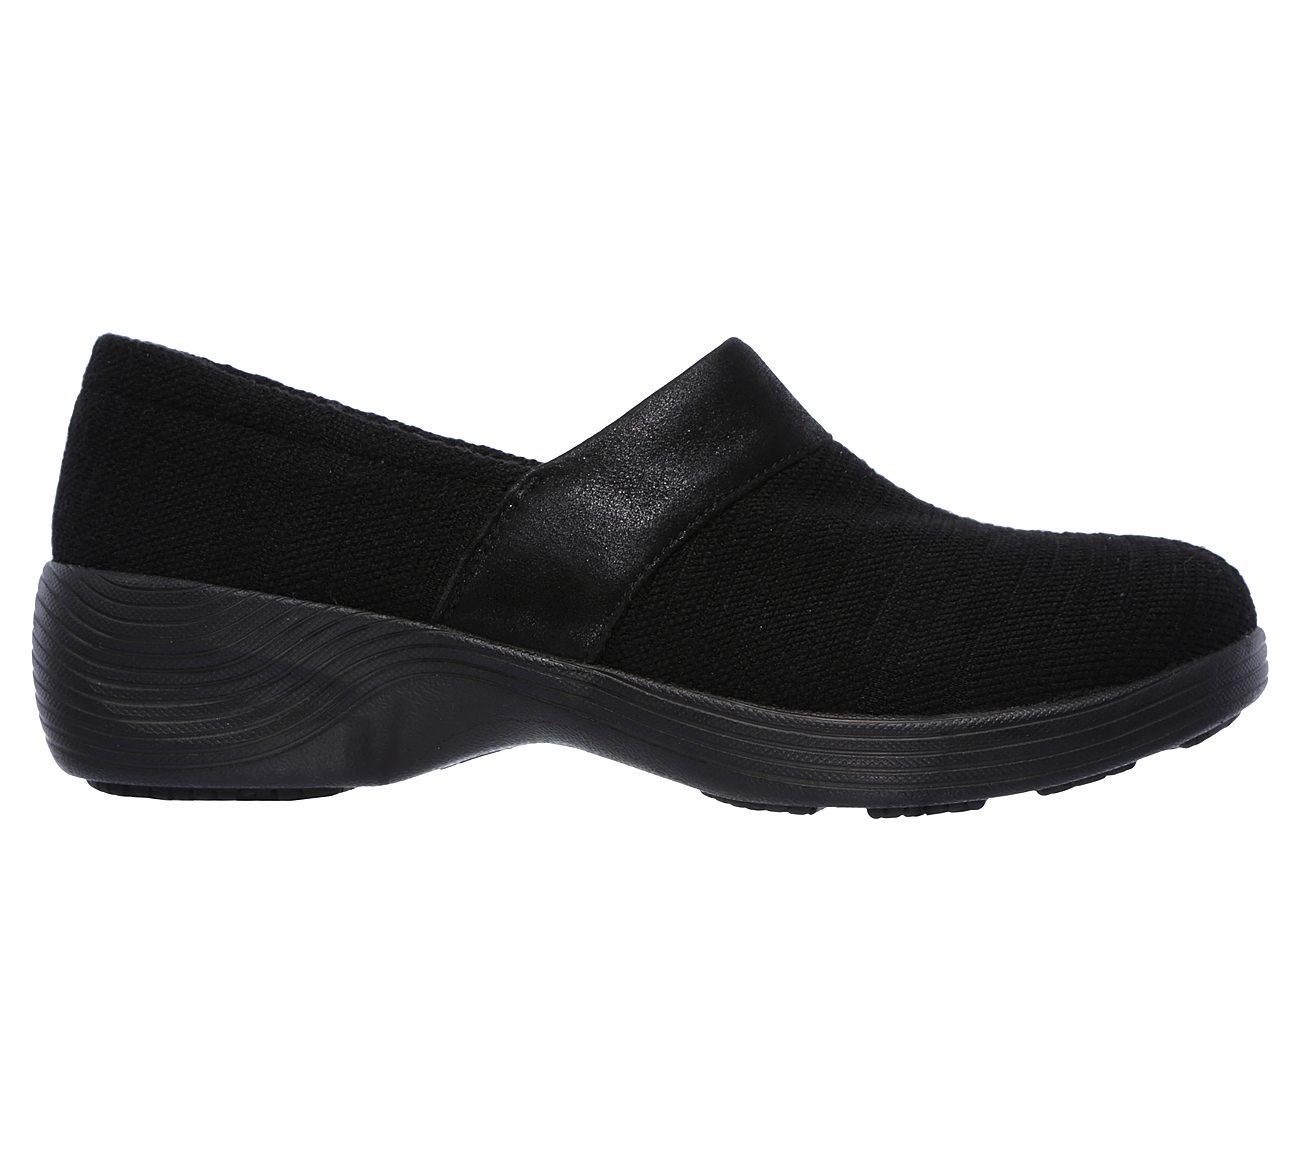 Buy Reduced Price Women's Skechers Gemma Space Trip Slip on Clogs Black